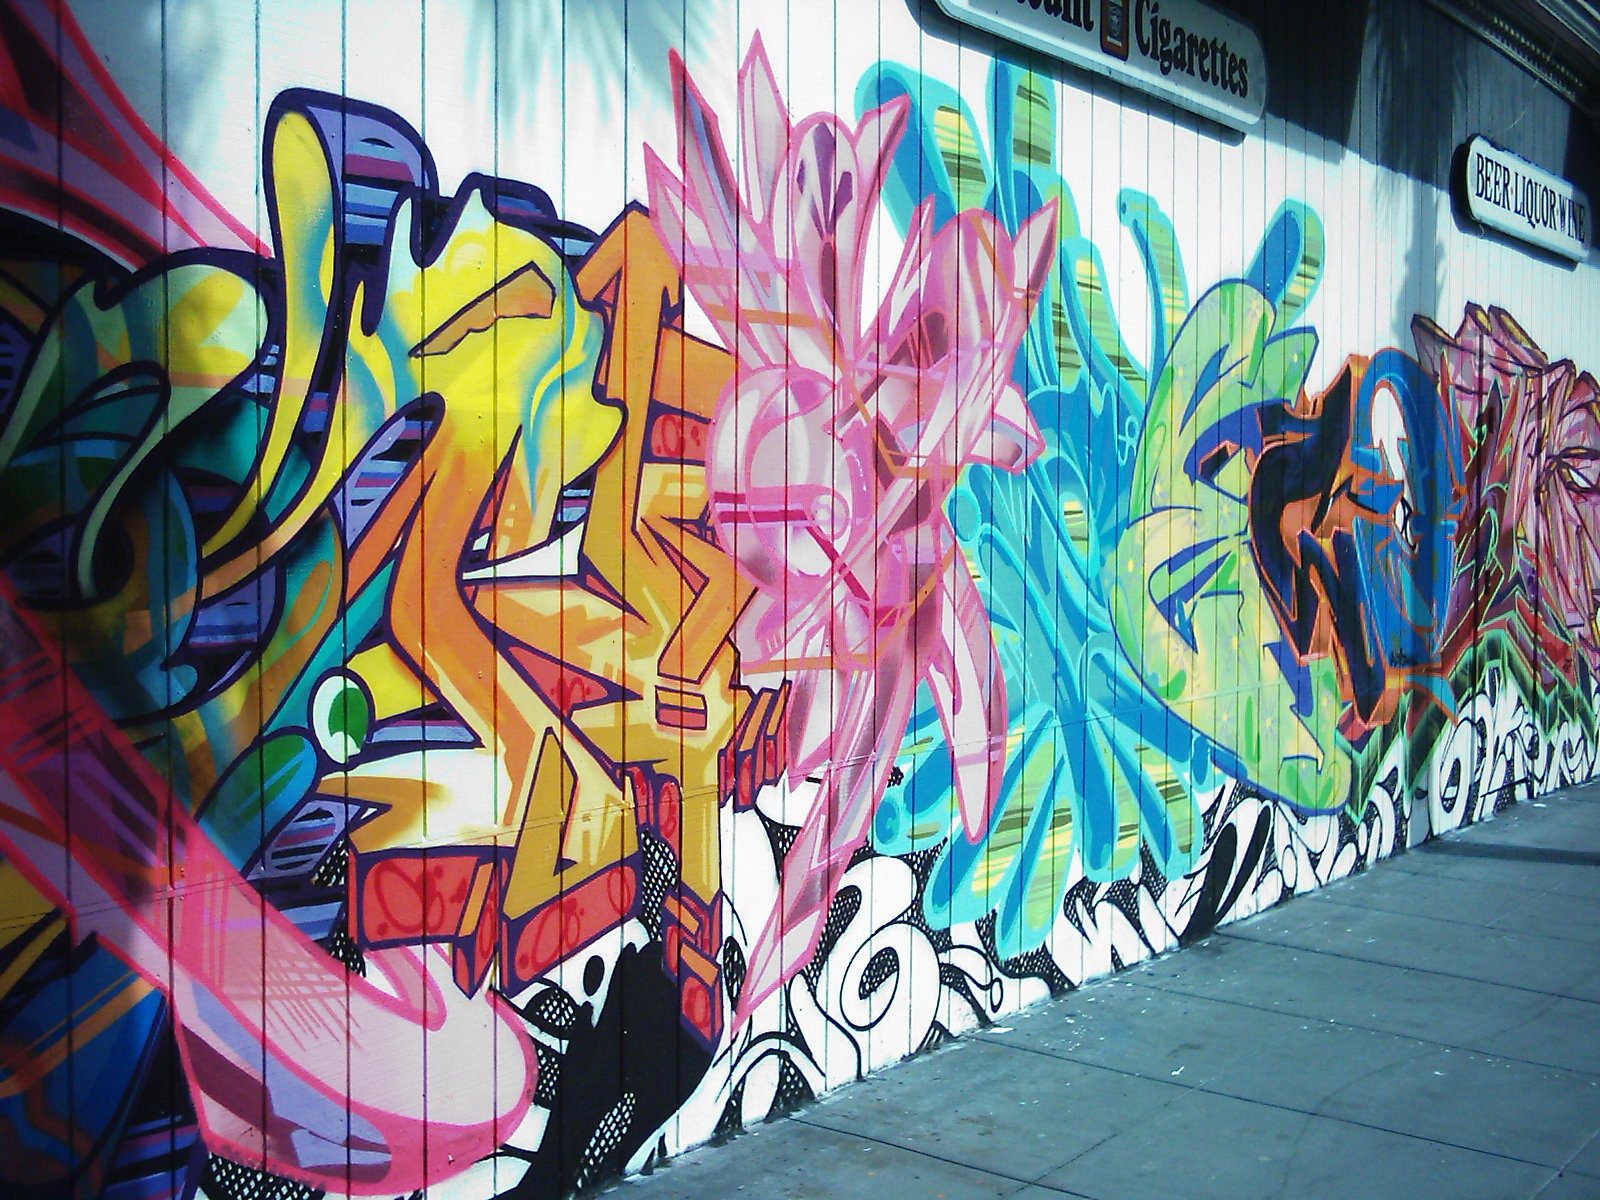 http://3.bp.blogspot.com/_Jx0sqzELZiE/TIiwJVPzw_I/AAAAAAAAAHI/EEvrteR5Jxg/s1600/Graffiti%252B(12).jpg